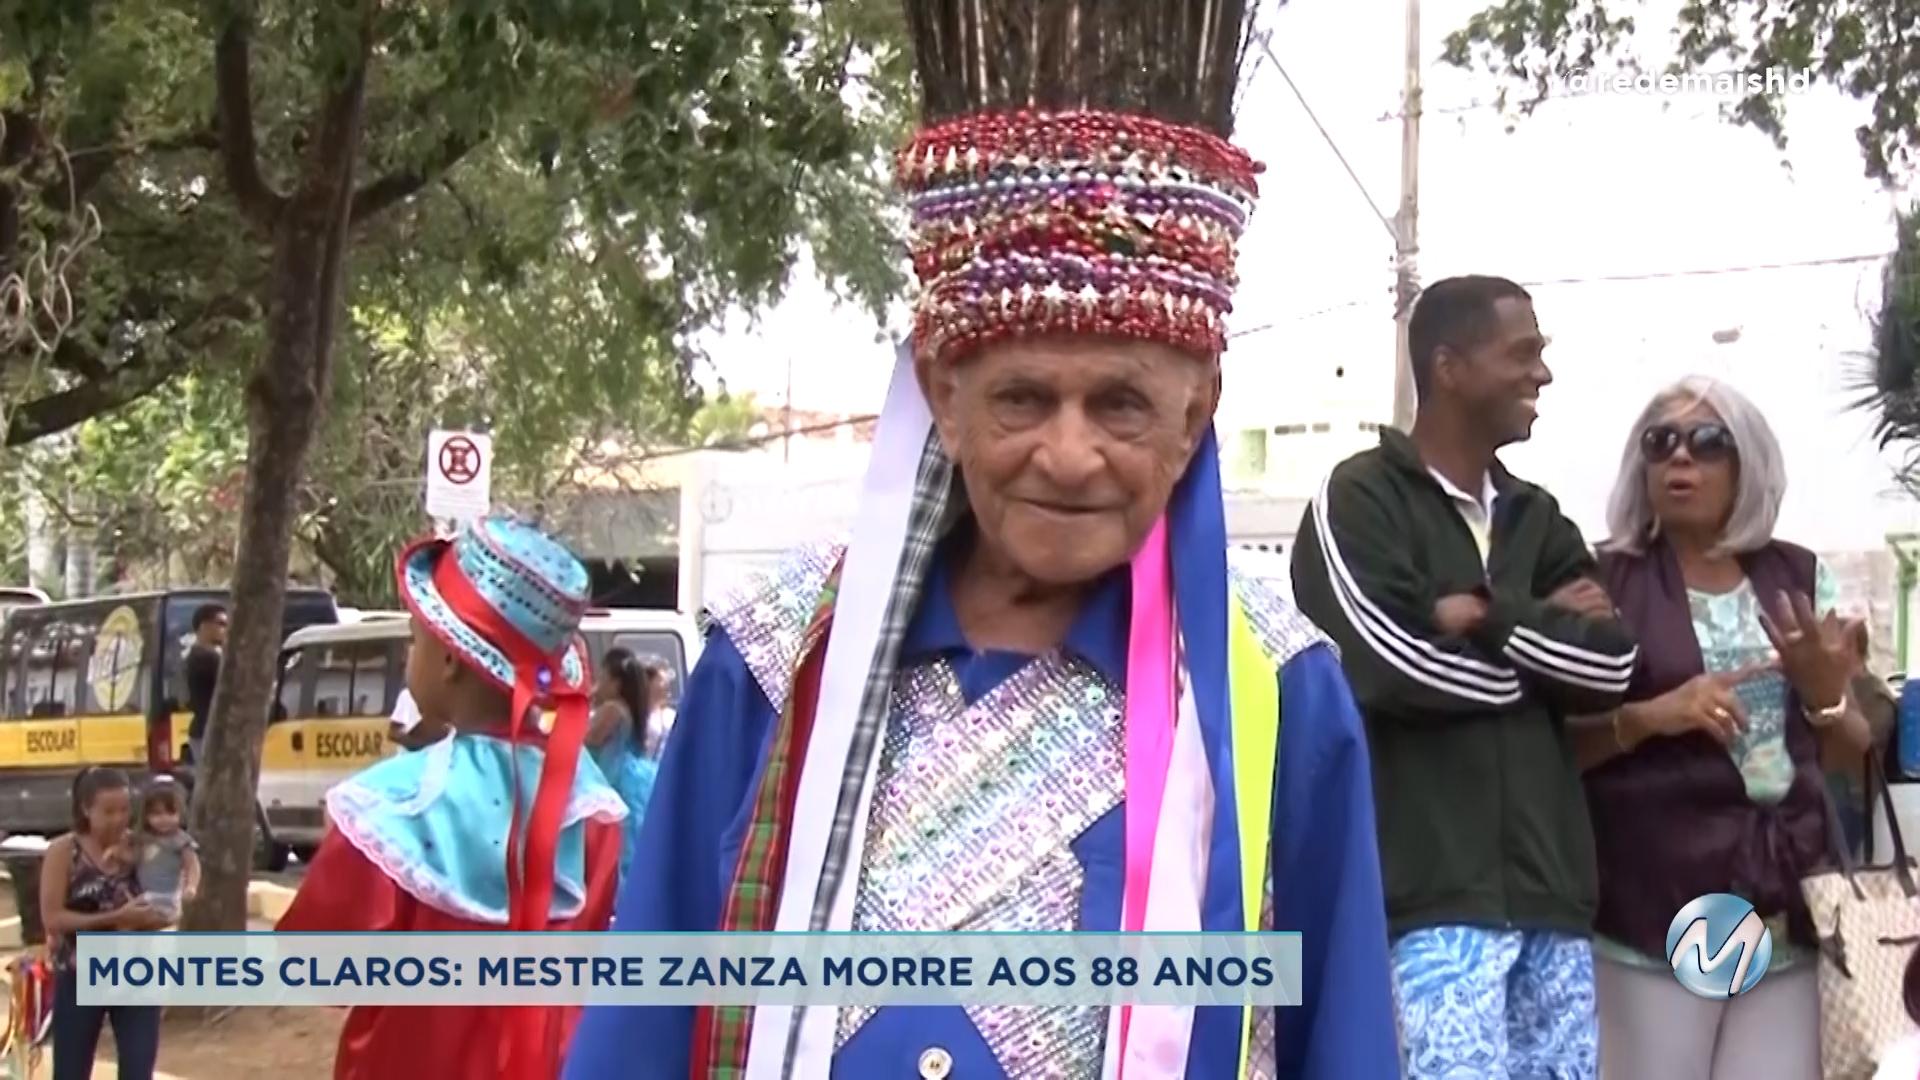 Mestre Zanza morre aos 88 anos em Montes Claros